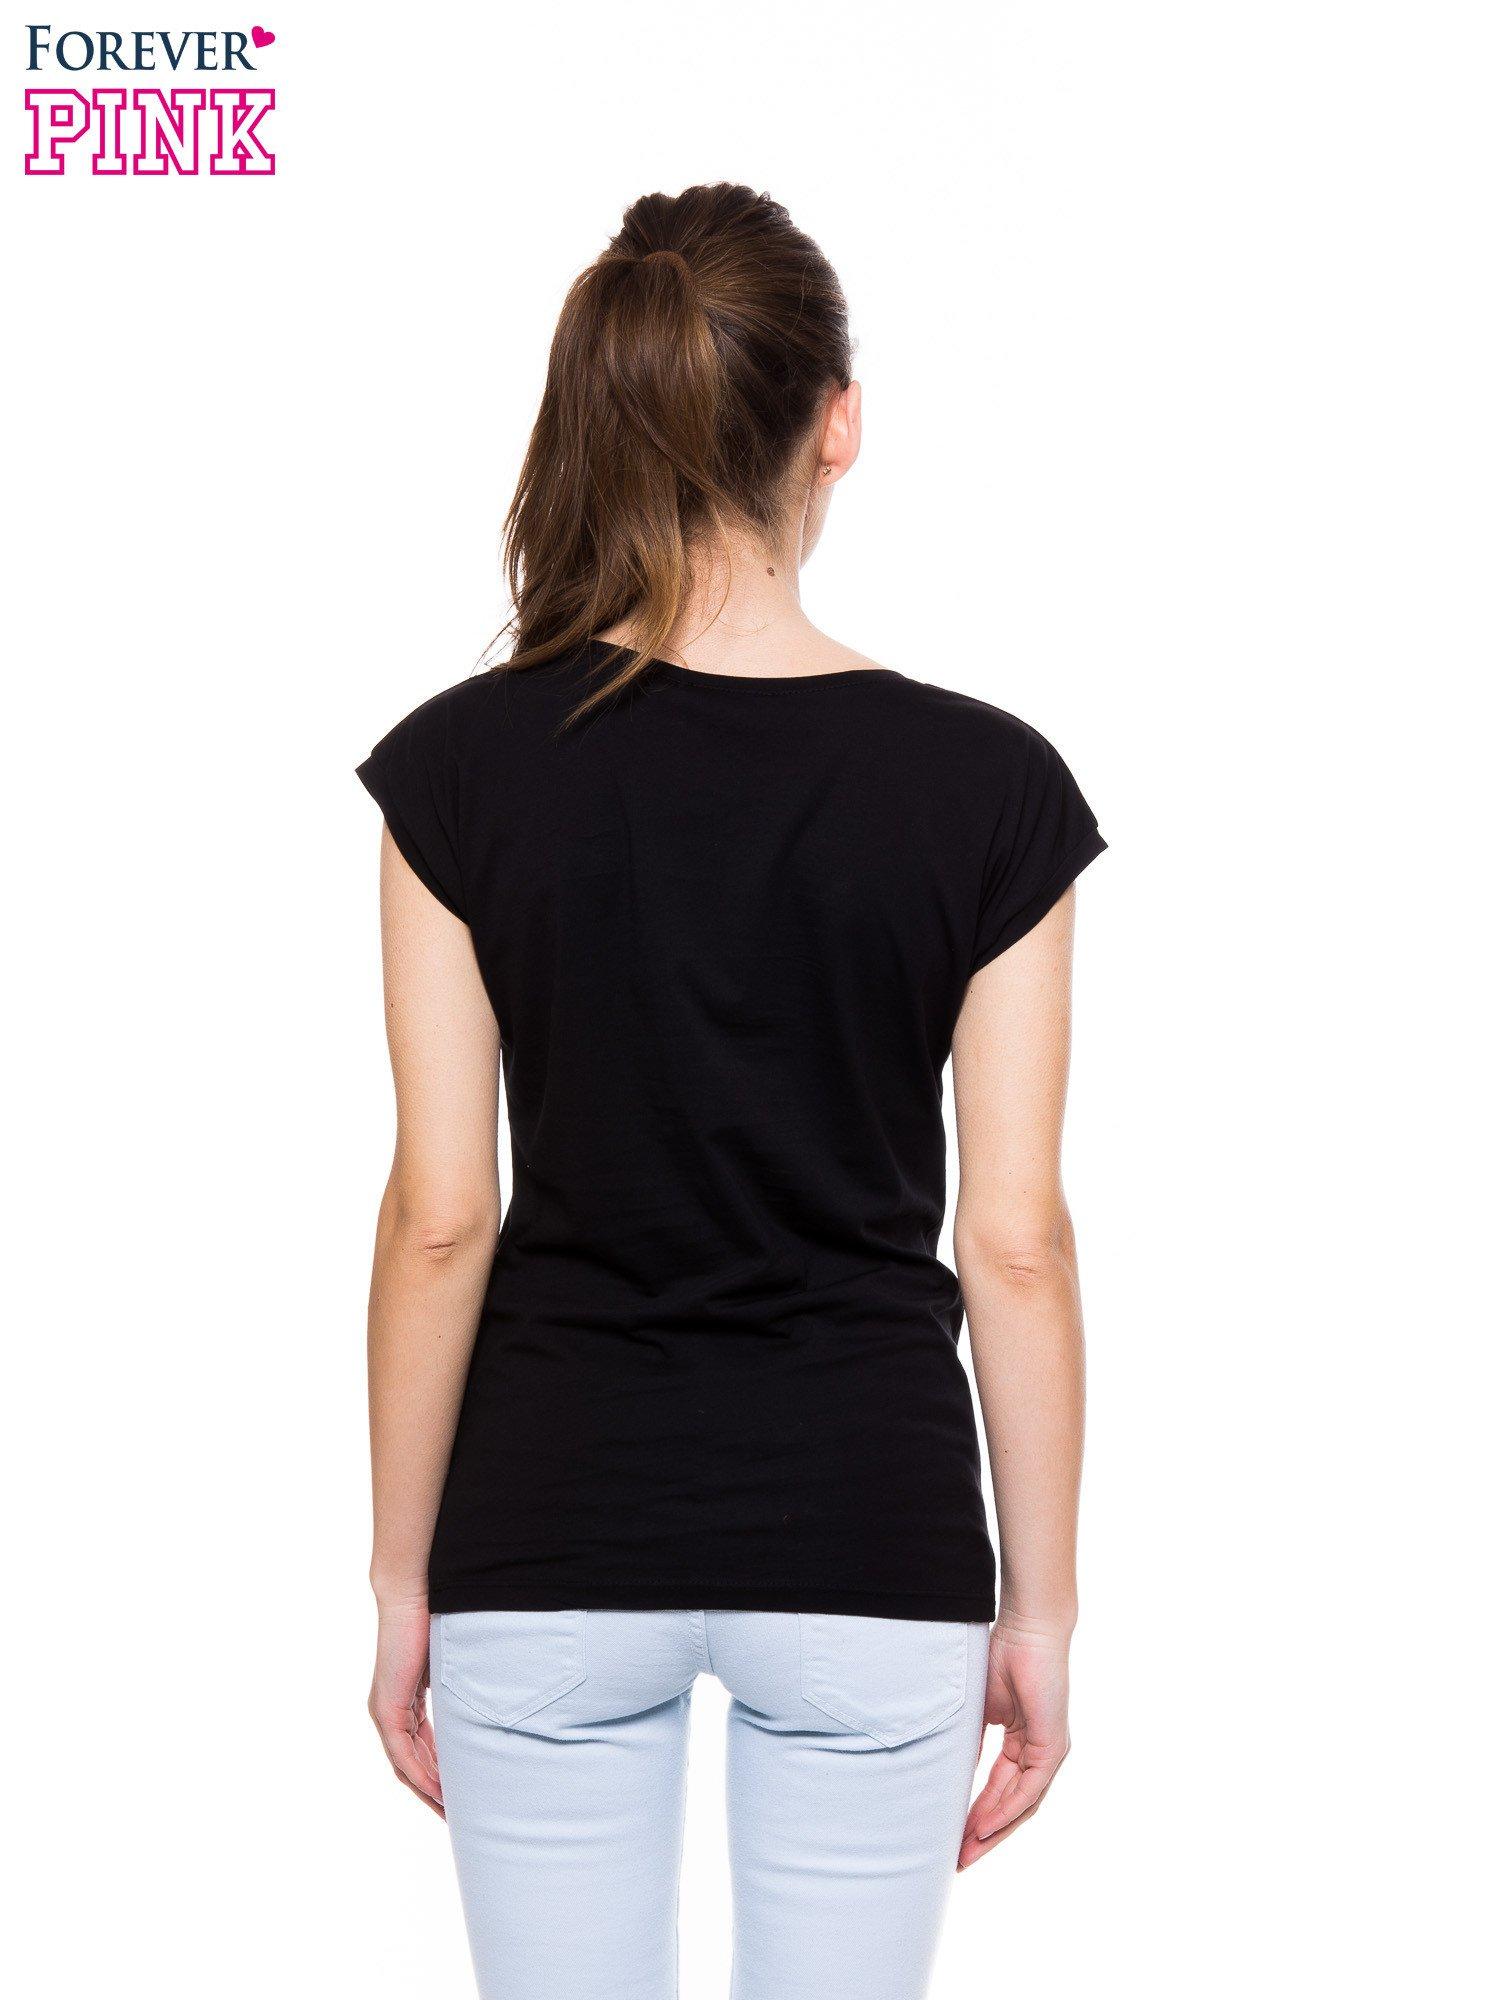 a7be2f35f Czarny t-shirt z nadrukiem PANI KIEROWNICZKA - T-shirt z nadrukiem ...